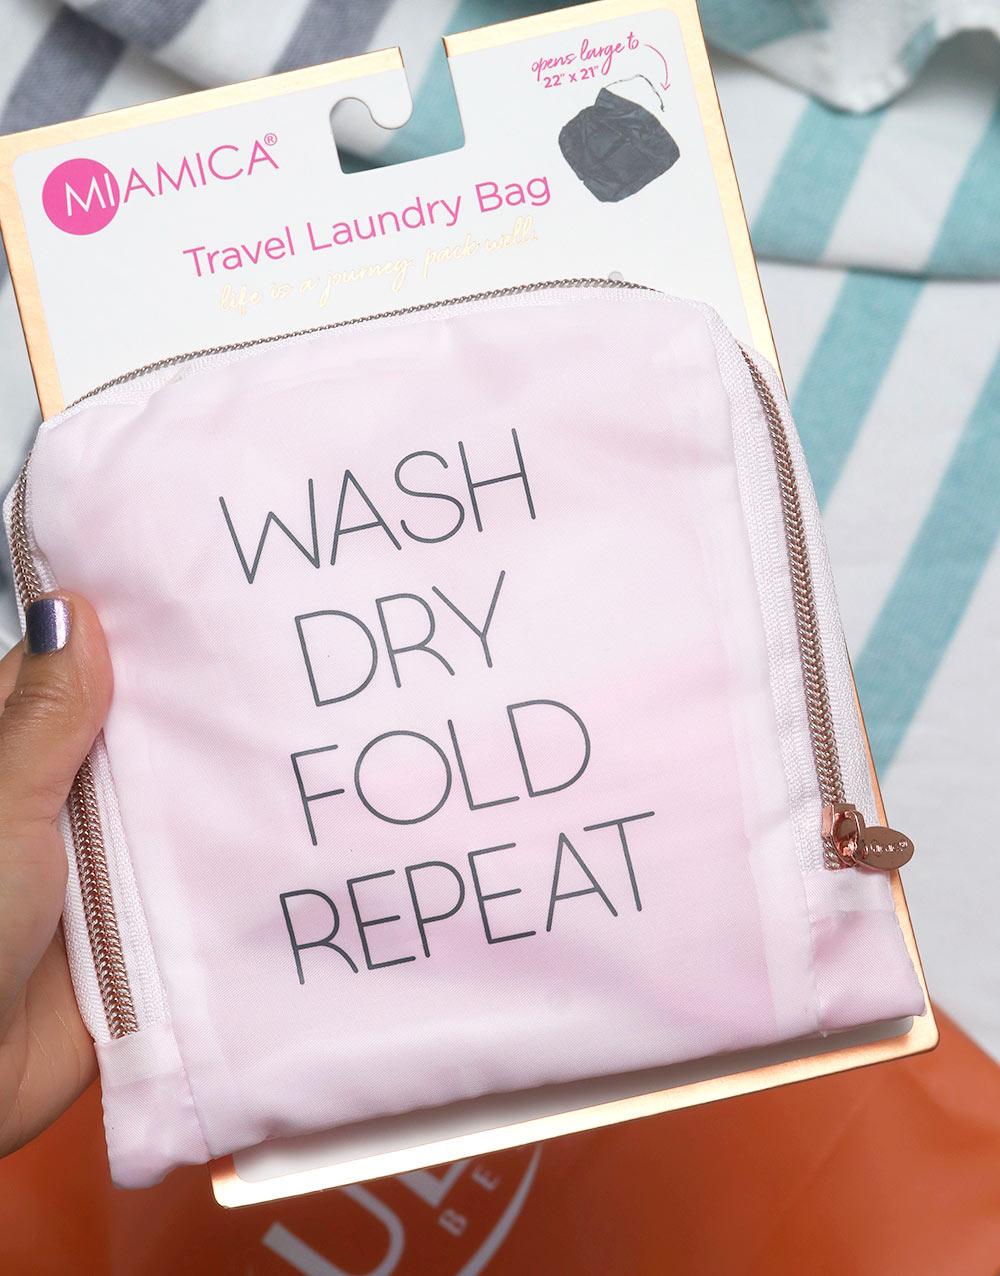 miamica travel laundry bag